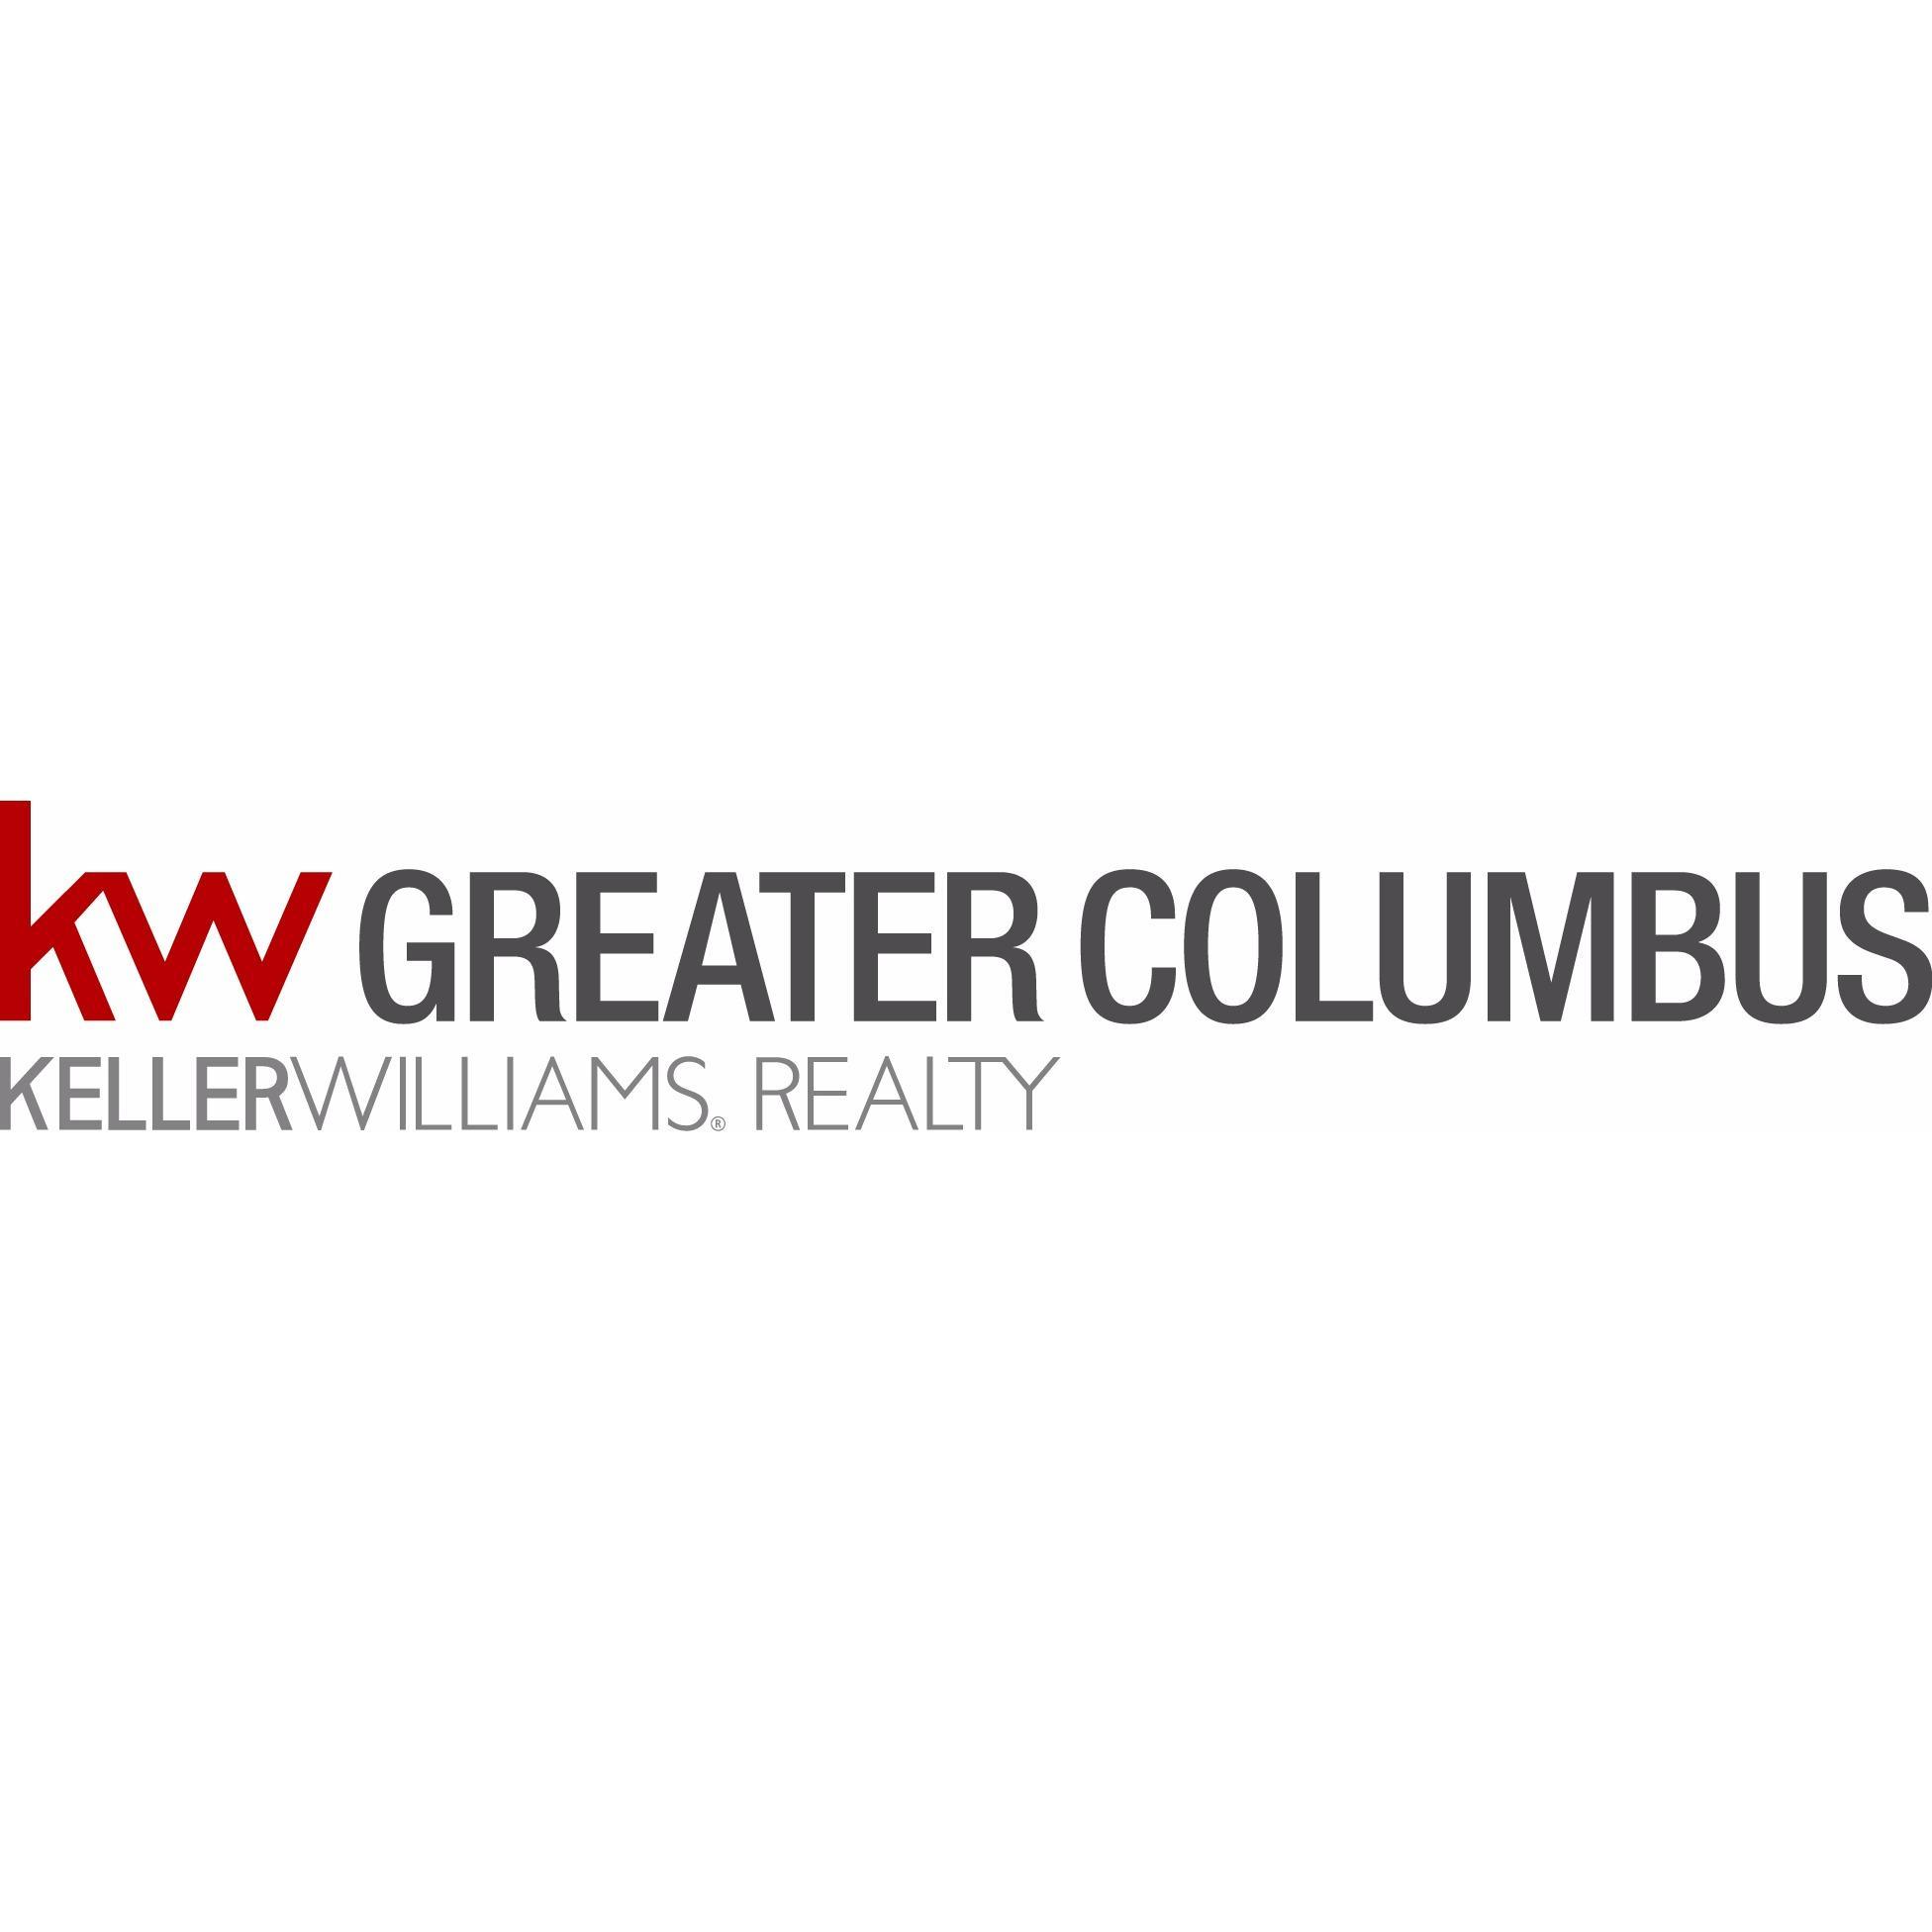 Mic Gordon, Keller Williams Greater Columbus Realty - Columbus, OH - Real Estate Agents